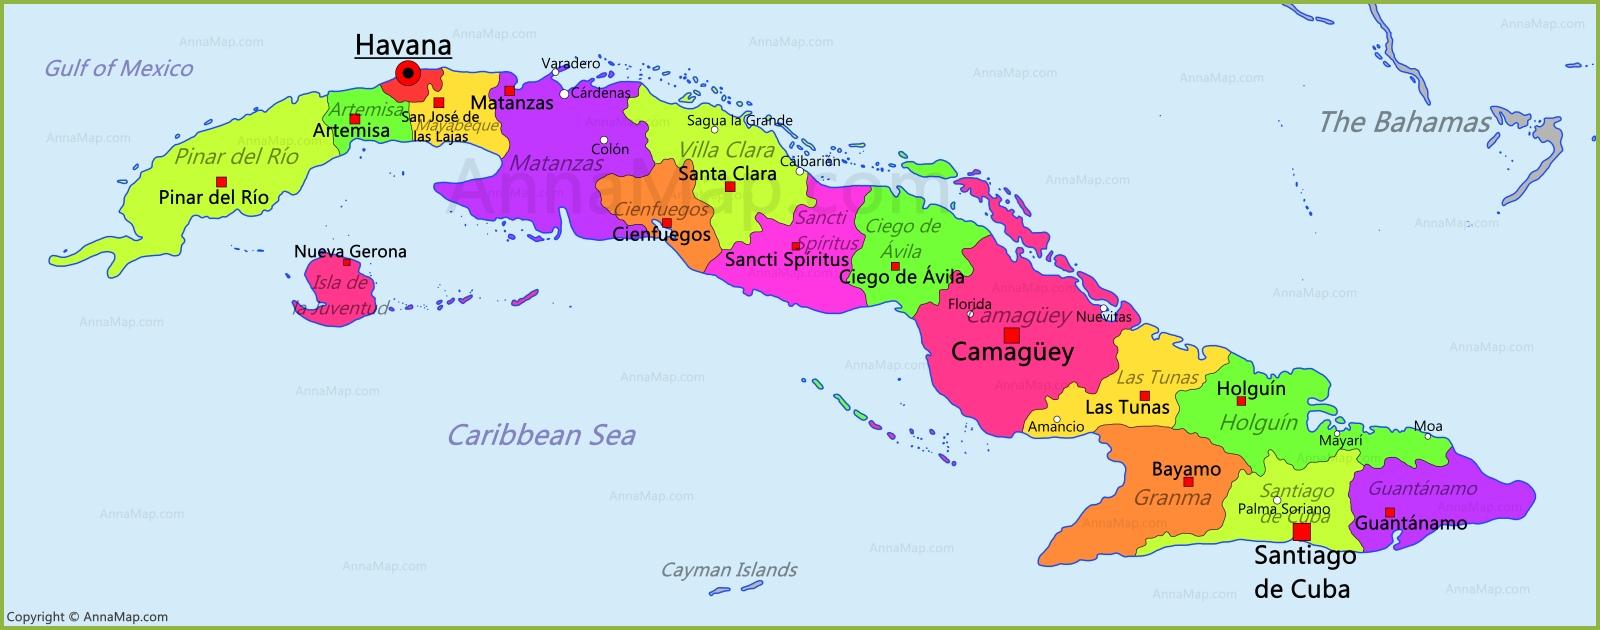 Cuba map map of cuba annamap cuba map gumiabroncs Gallery